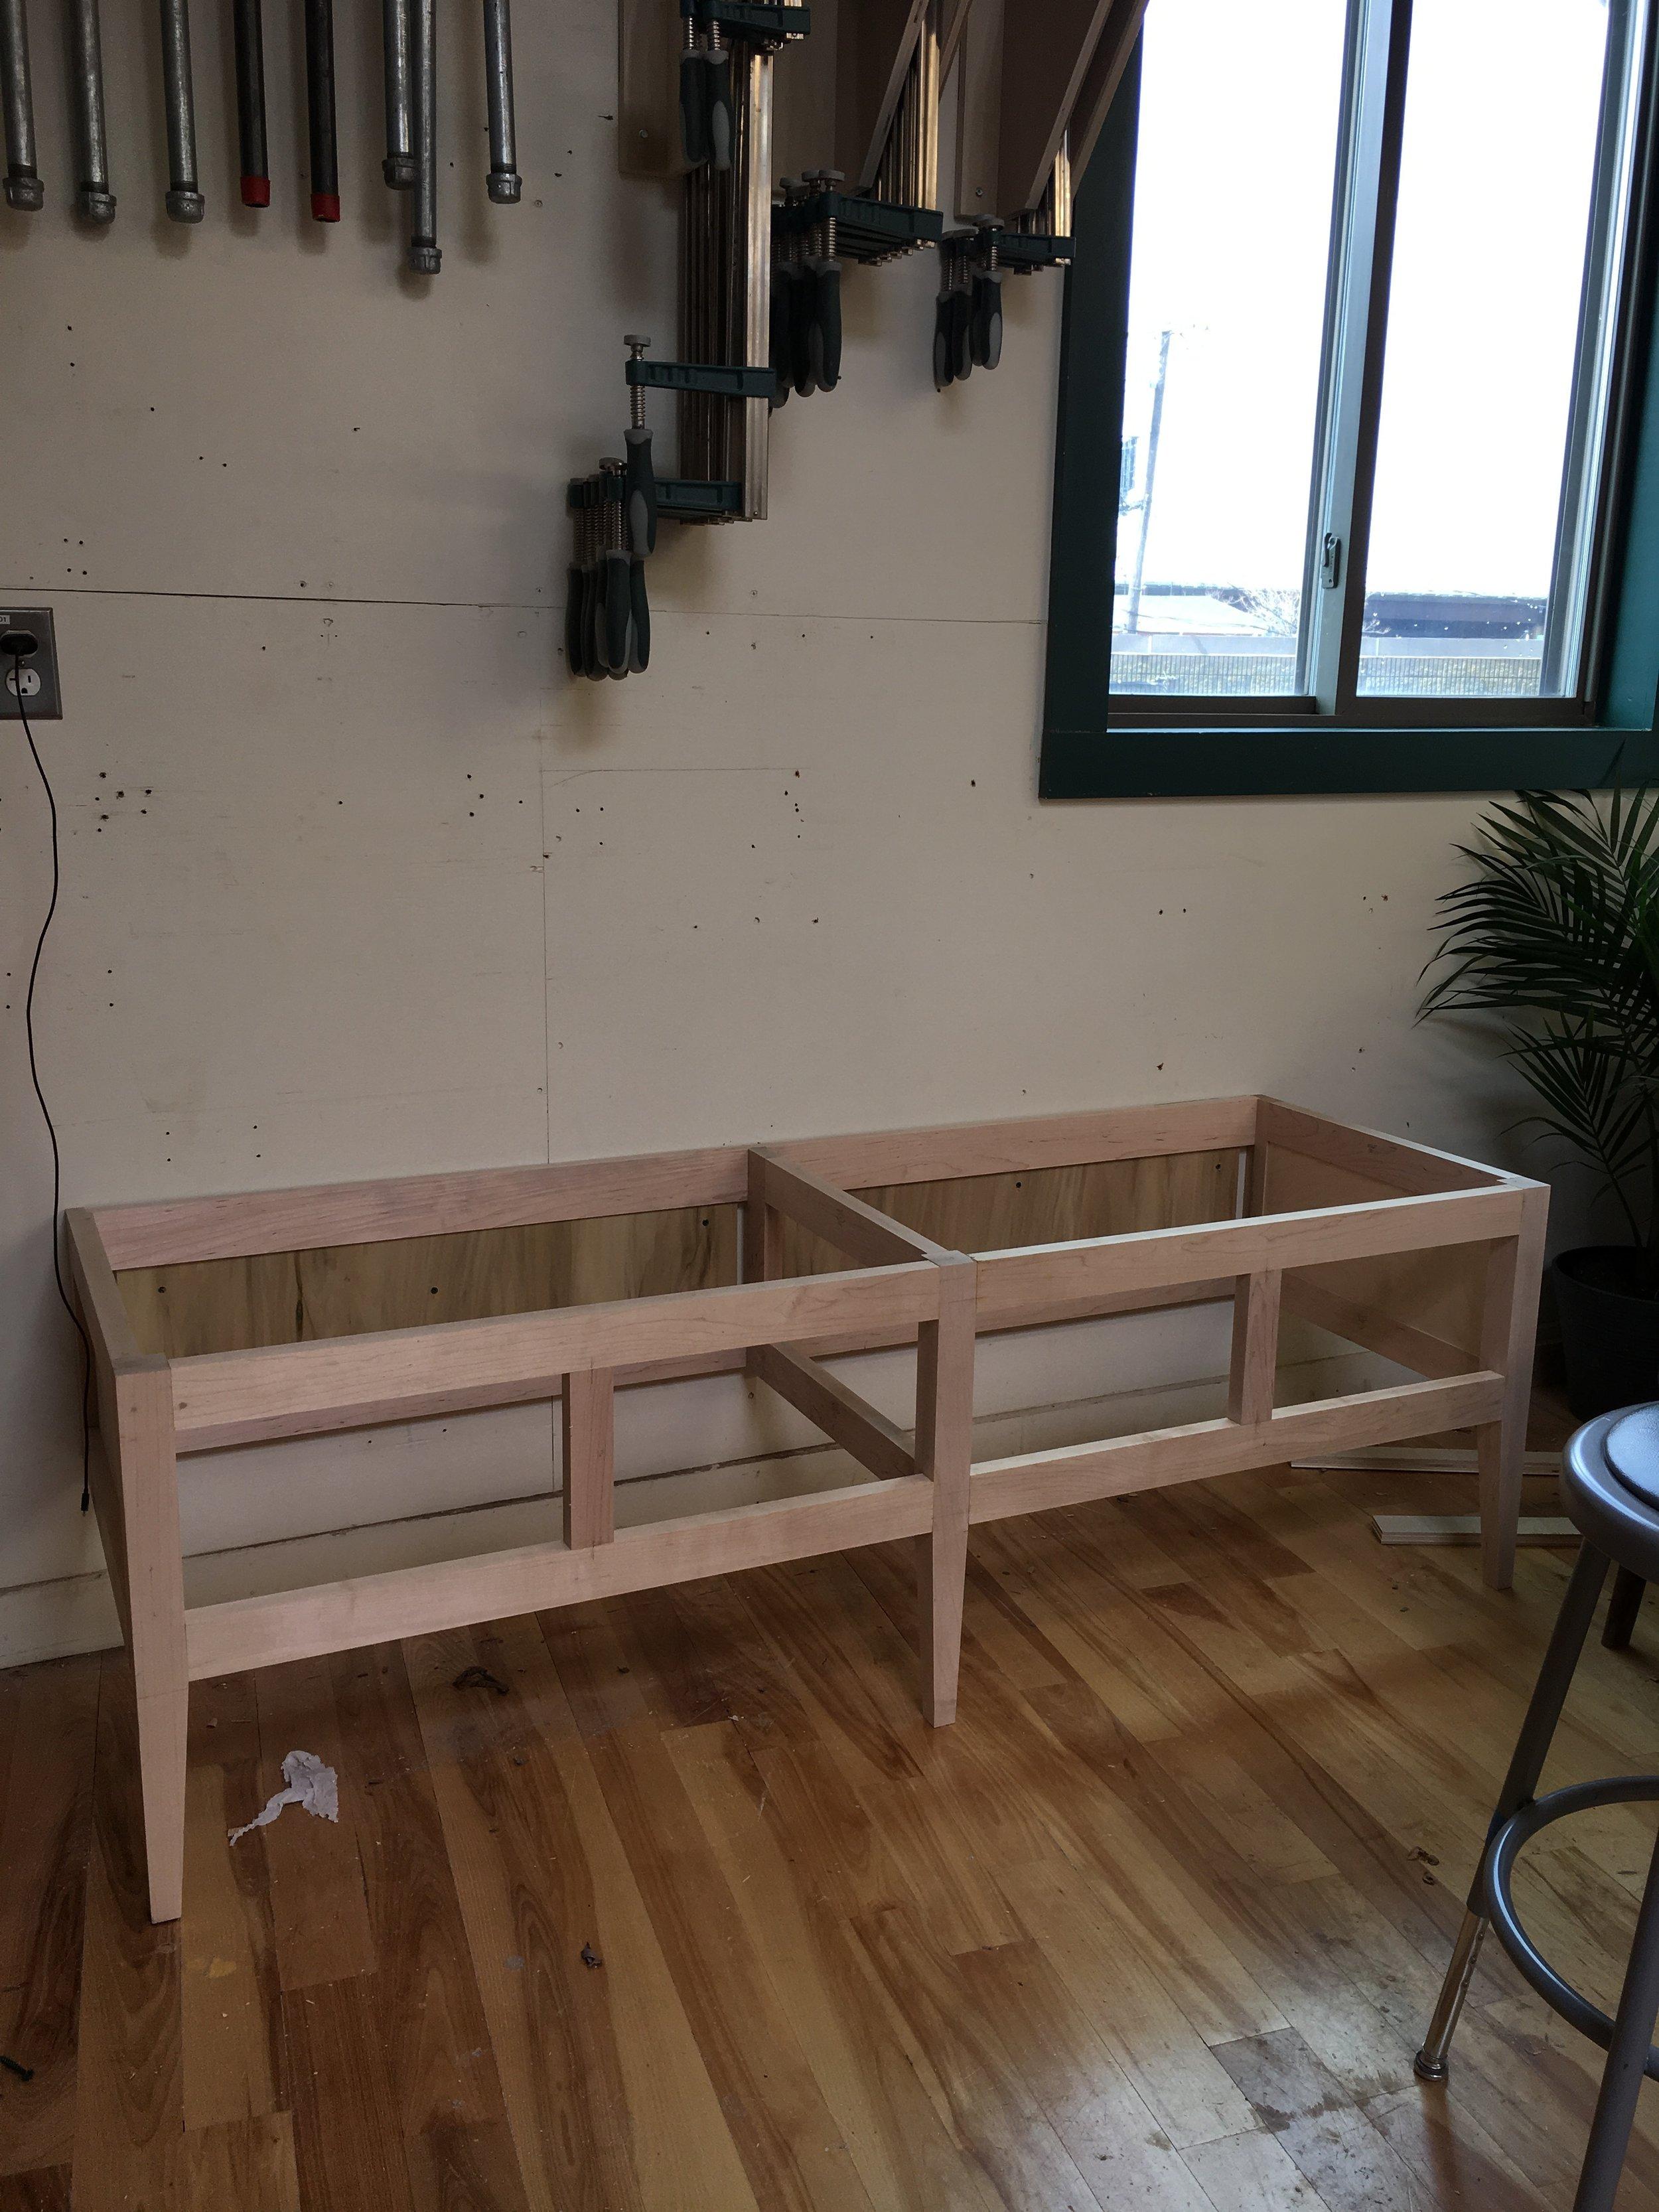 Hone Design Co._Dorchester Bench 3